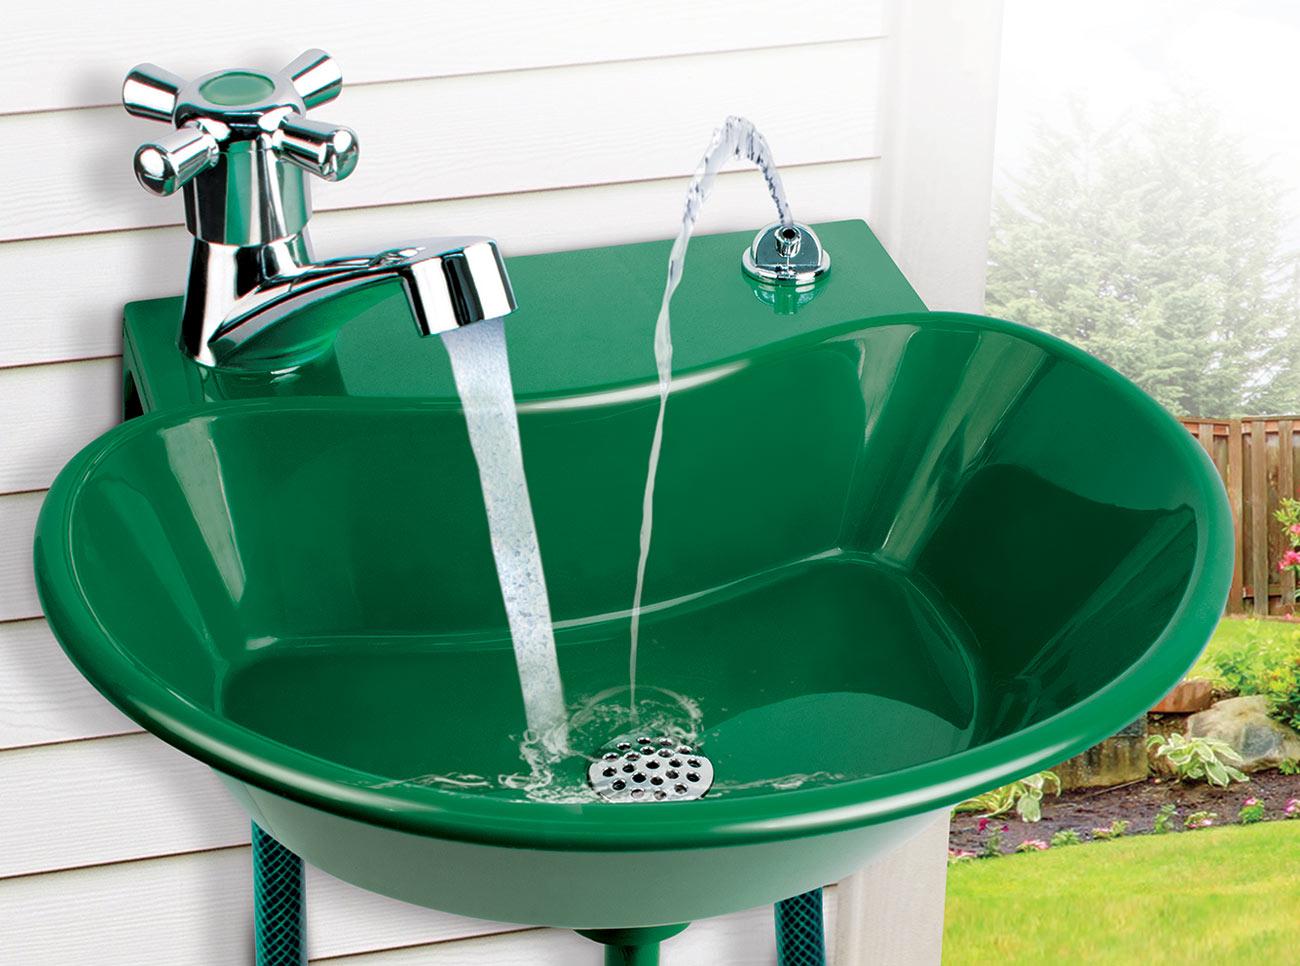 Outdoor Sink Drain Ideas Garden Kitchen Cabinet Diy Utility Concrete Rustic Camping Drinking Gear Expocafeperu Com